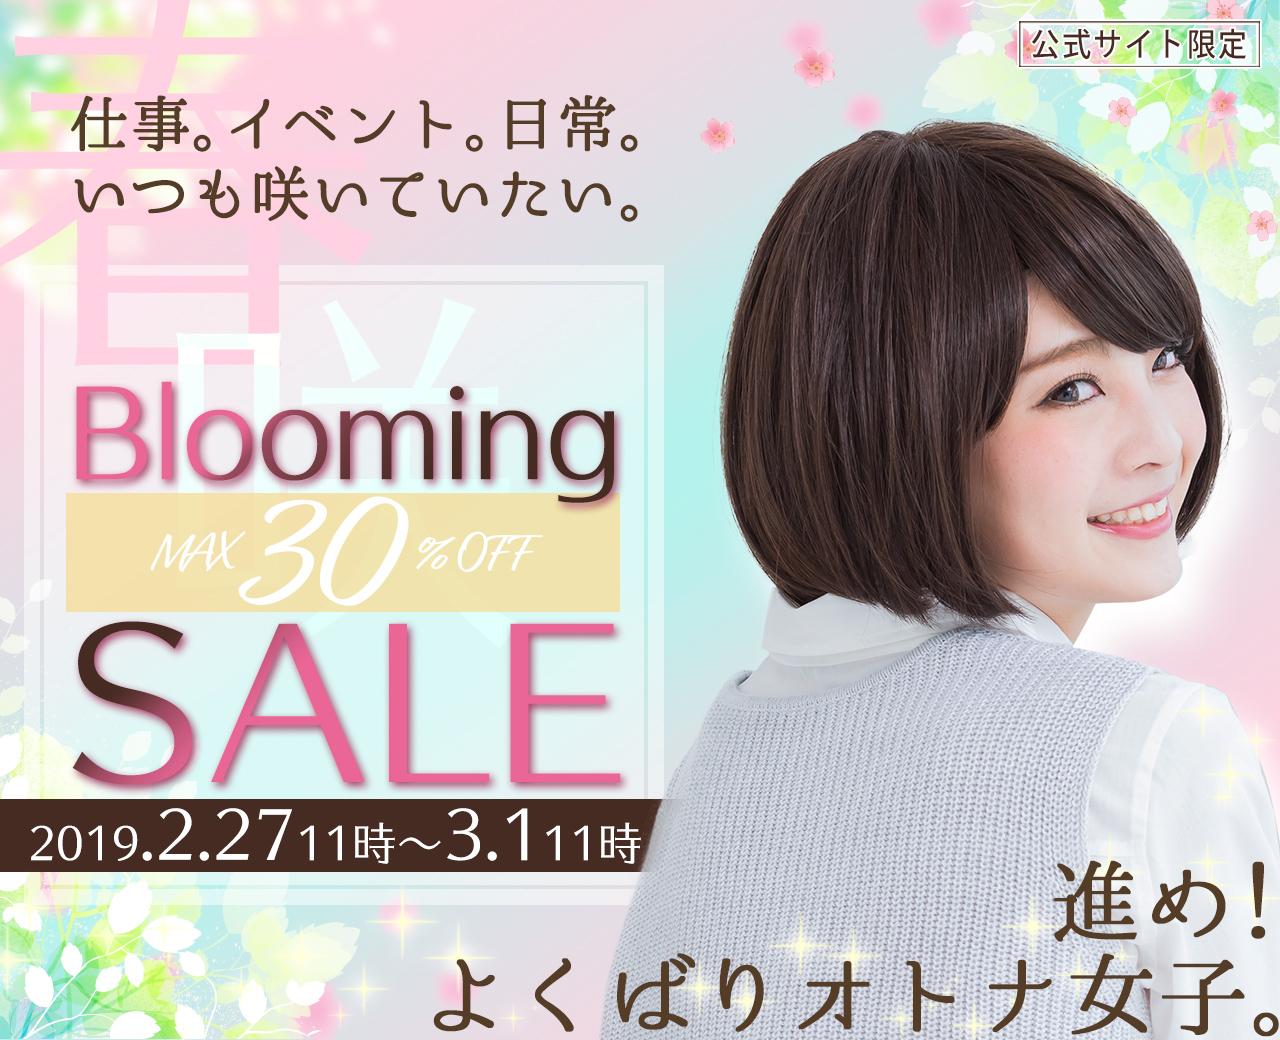 BloomingSALE最大30%OFF!!